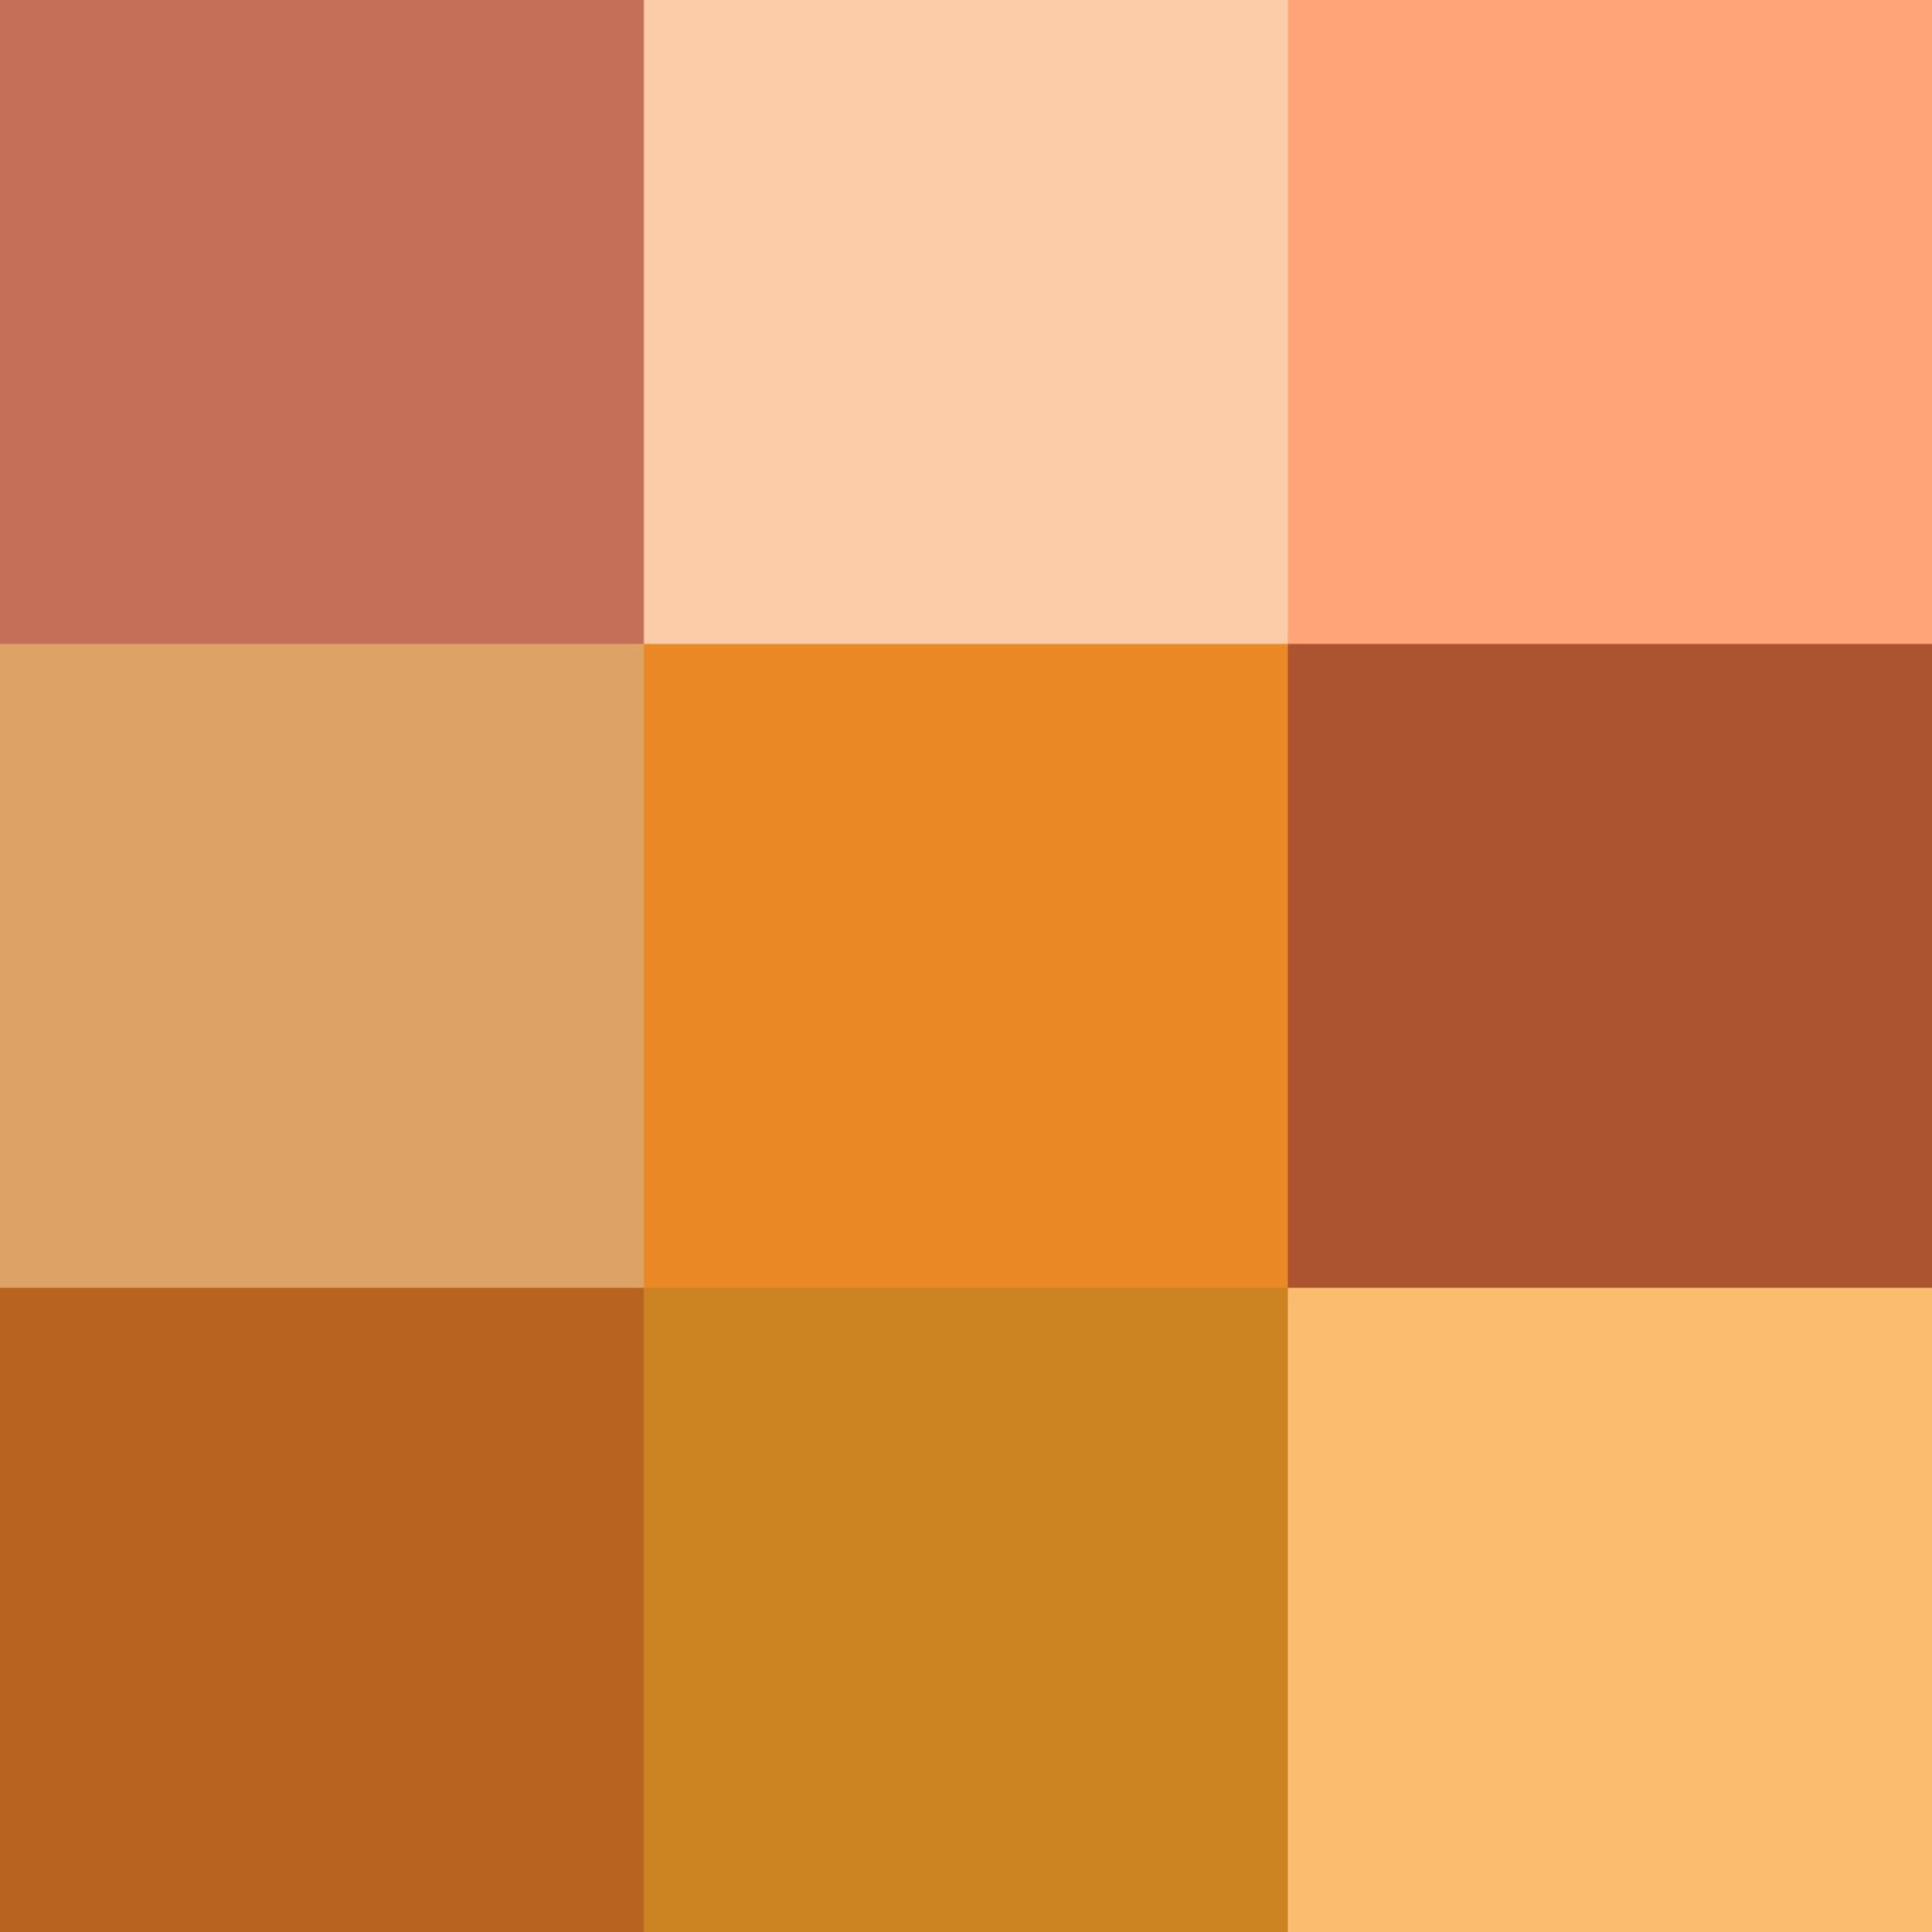 Best ideas about Orange Paint Colors . Save or Pin Orange colour the free encyclopedia Now.